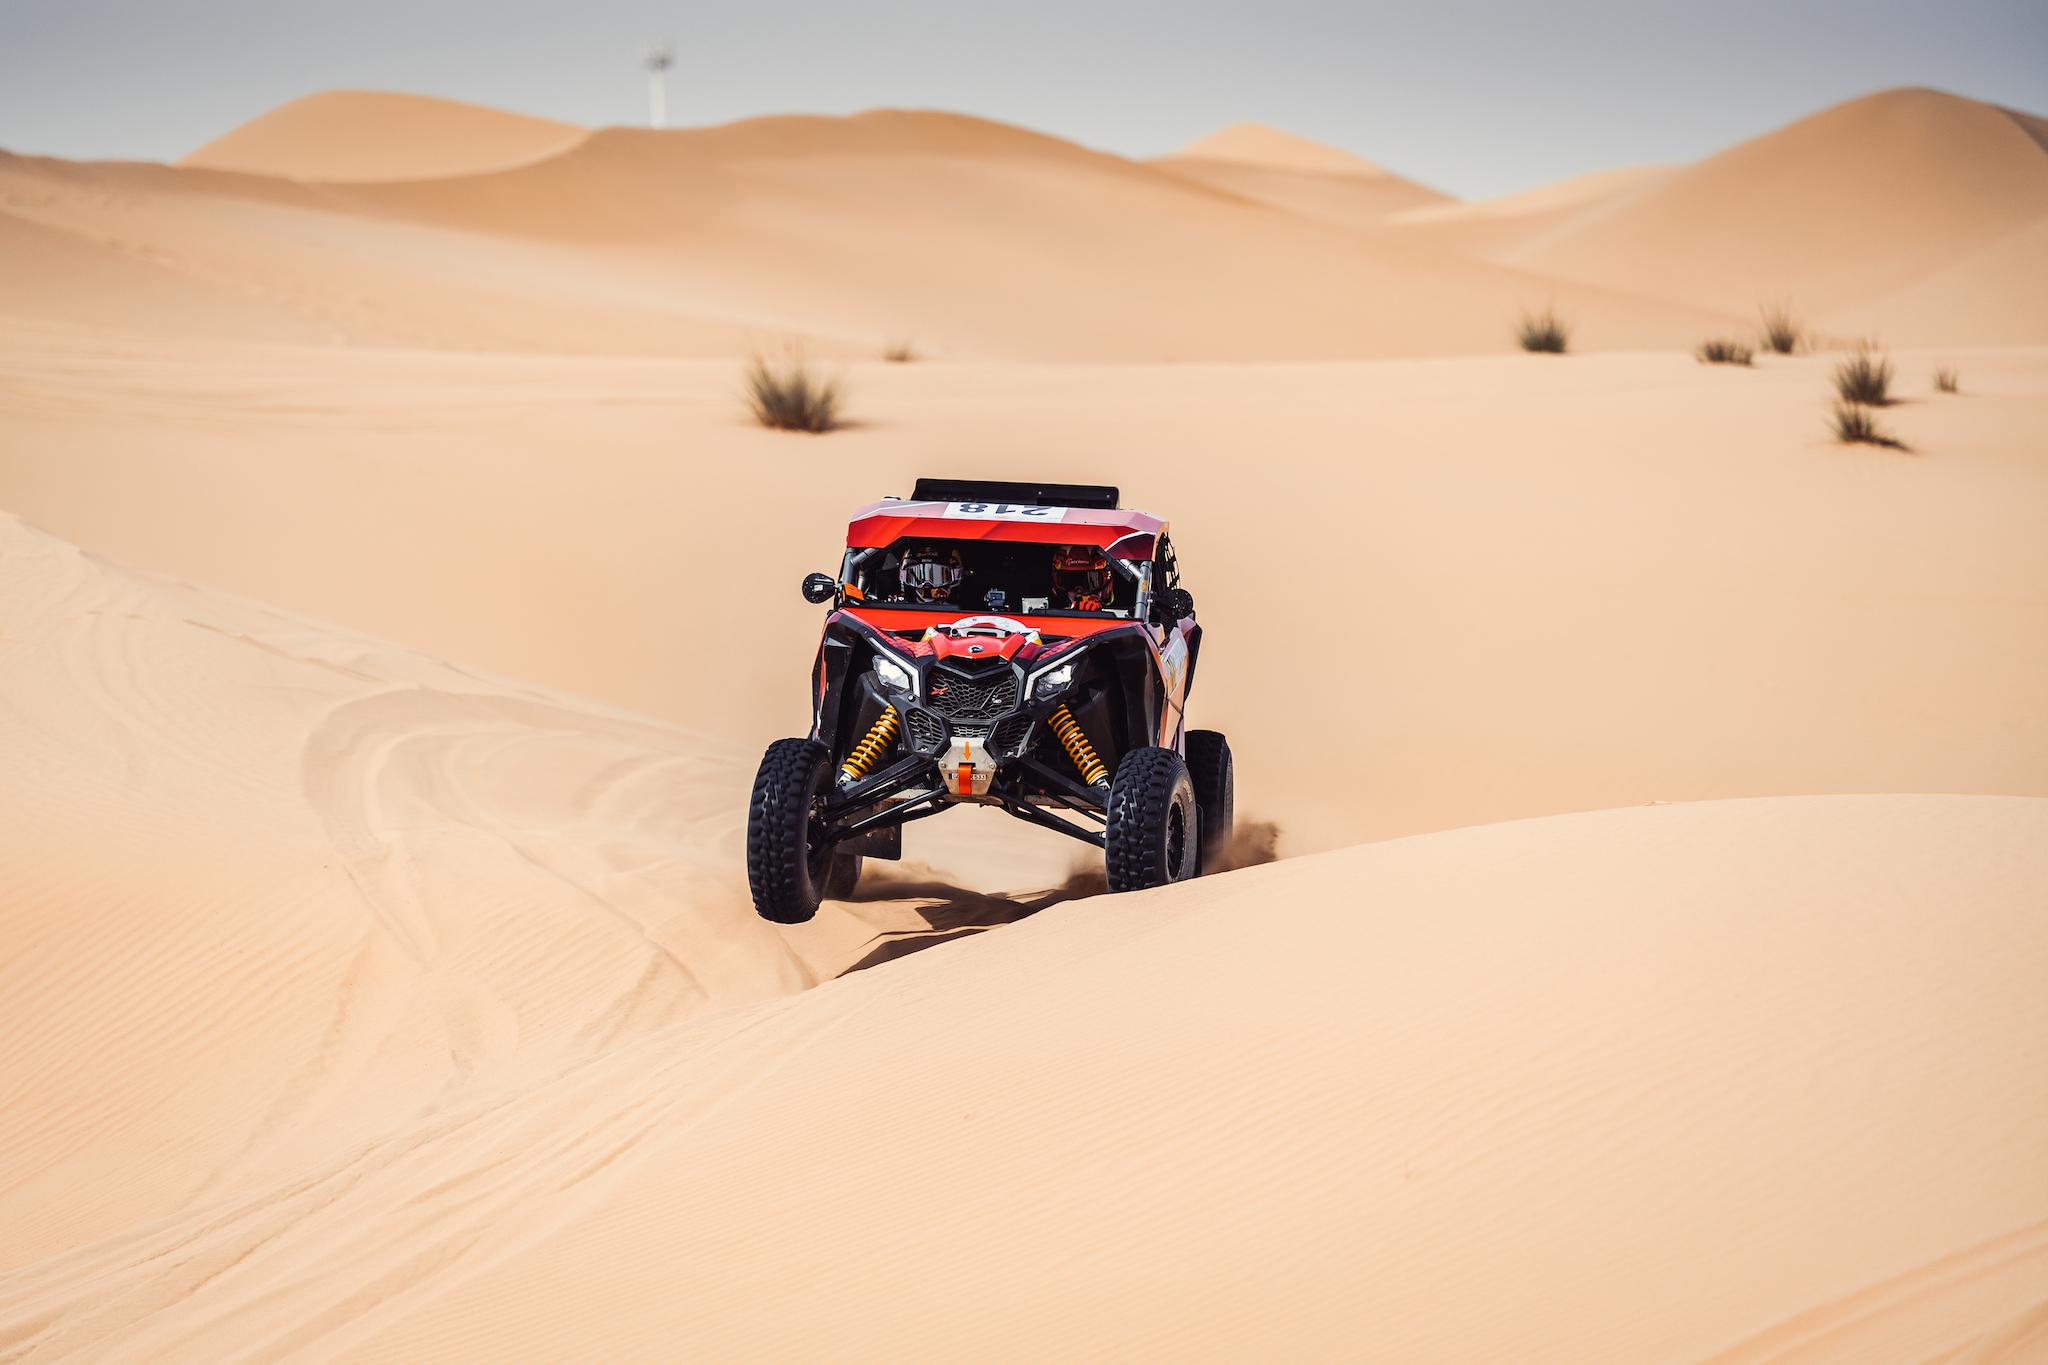 2021 43º Rallye Raid Dakar - Arabia Saudí [3-15 Enero] - Página 15 EumyioMXIAAx5ia?format=jpg&name=large